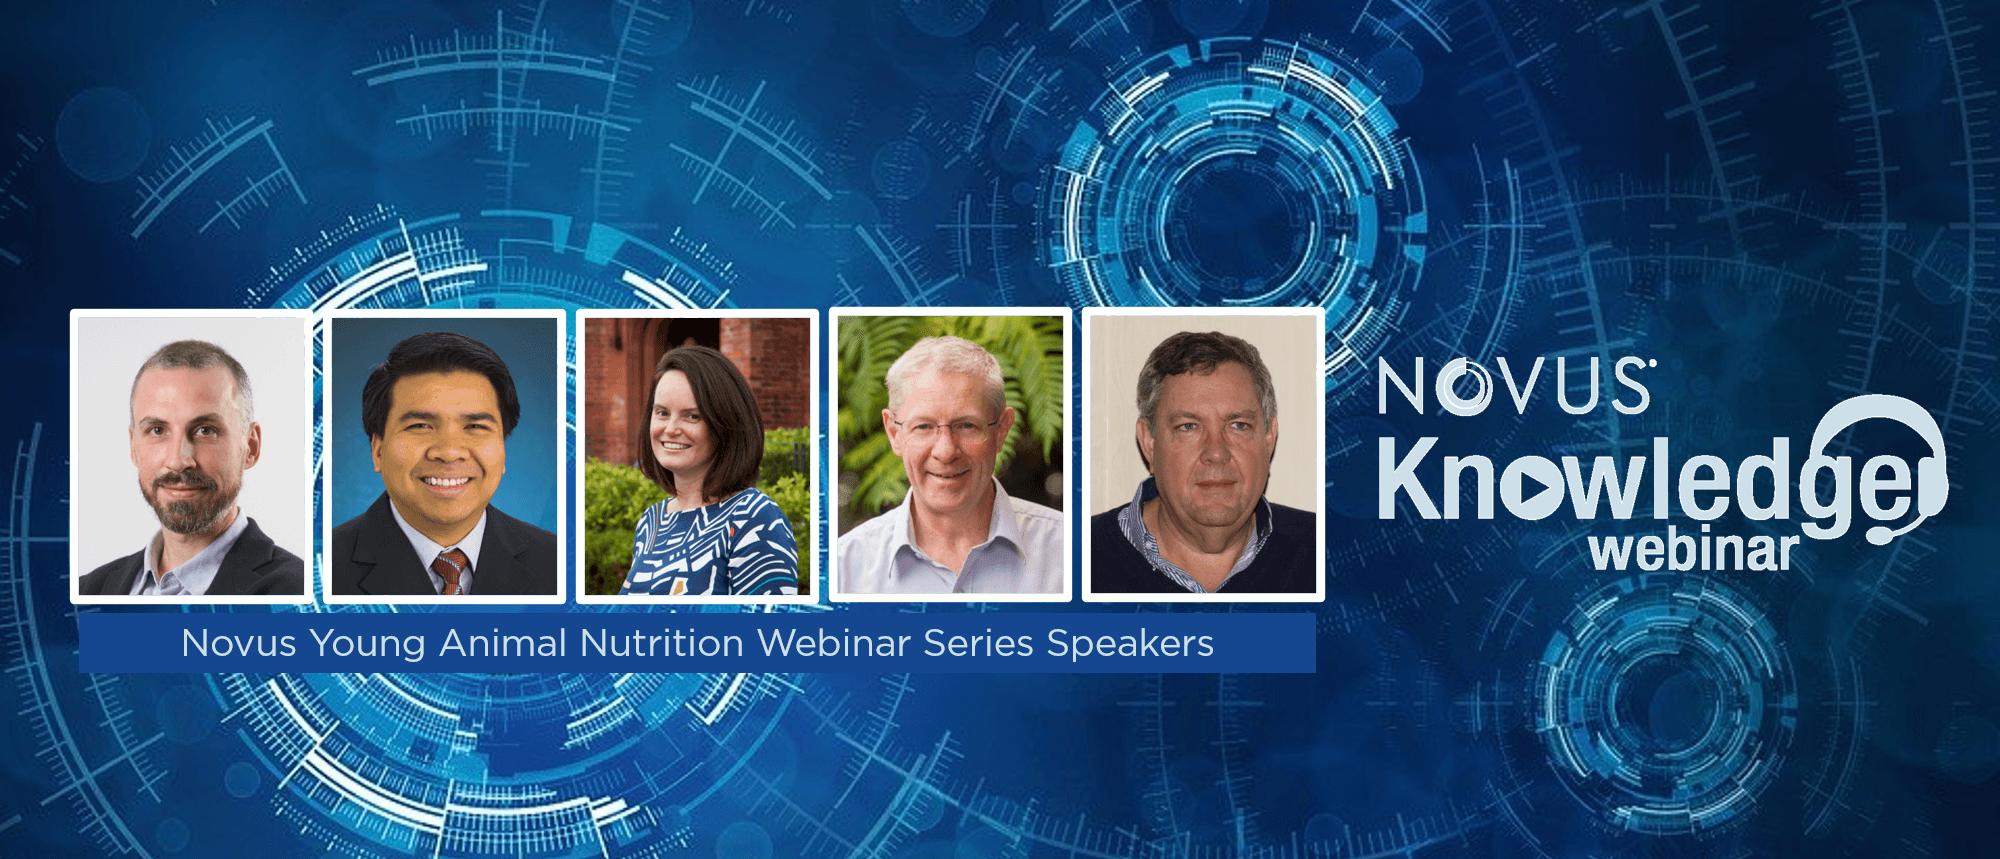 Novus Young Animal Nutrition Webinar Series